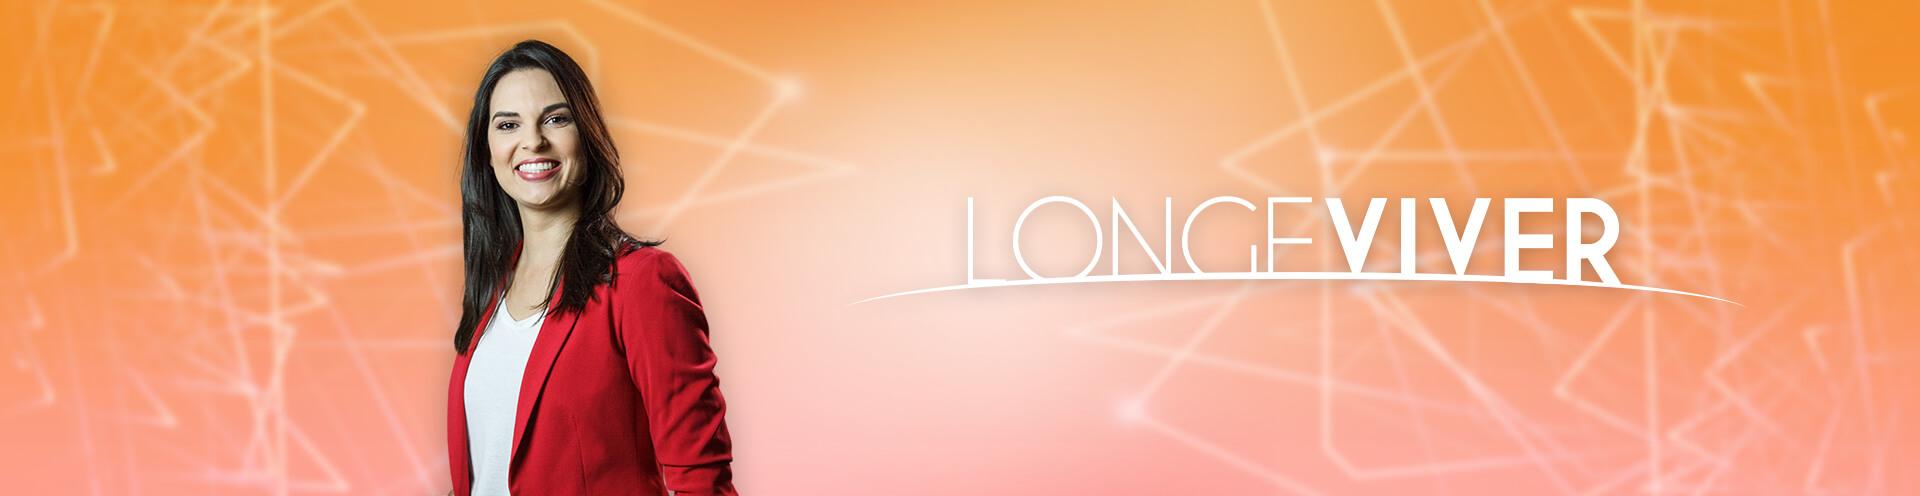 LONGEVIVER - NT Play